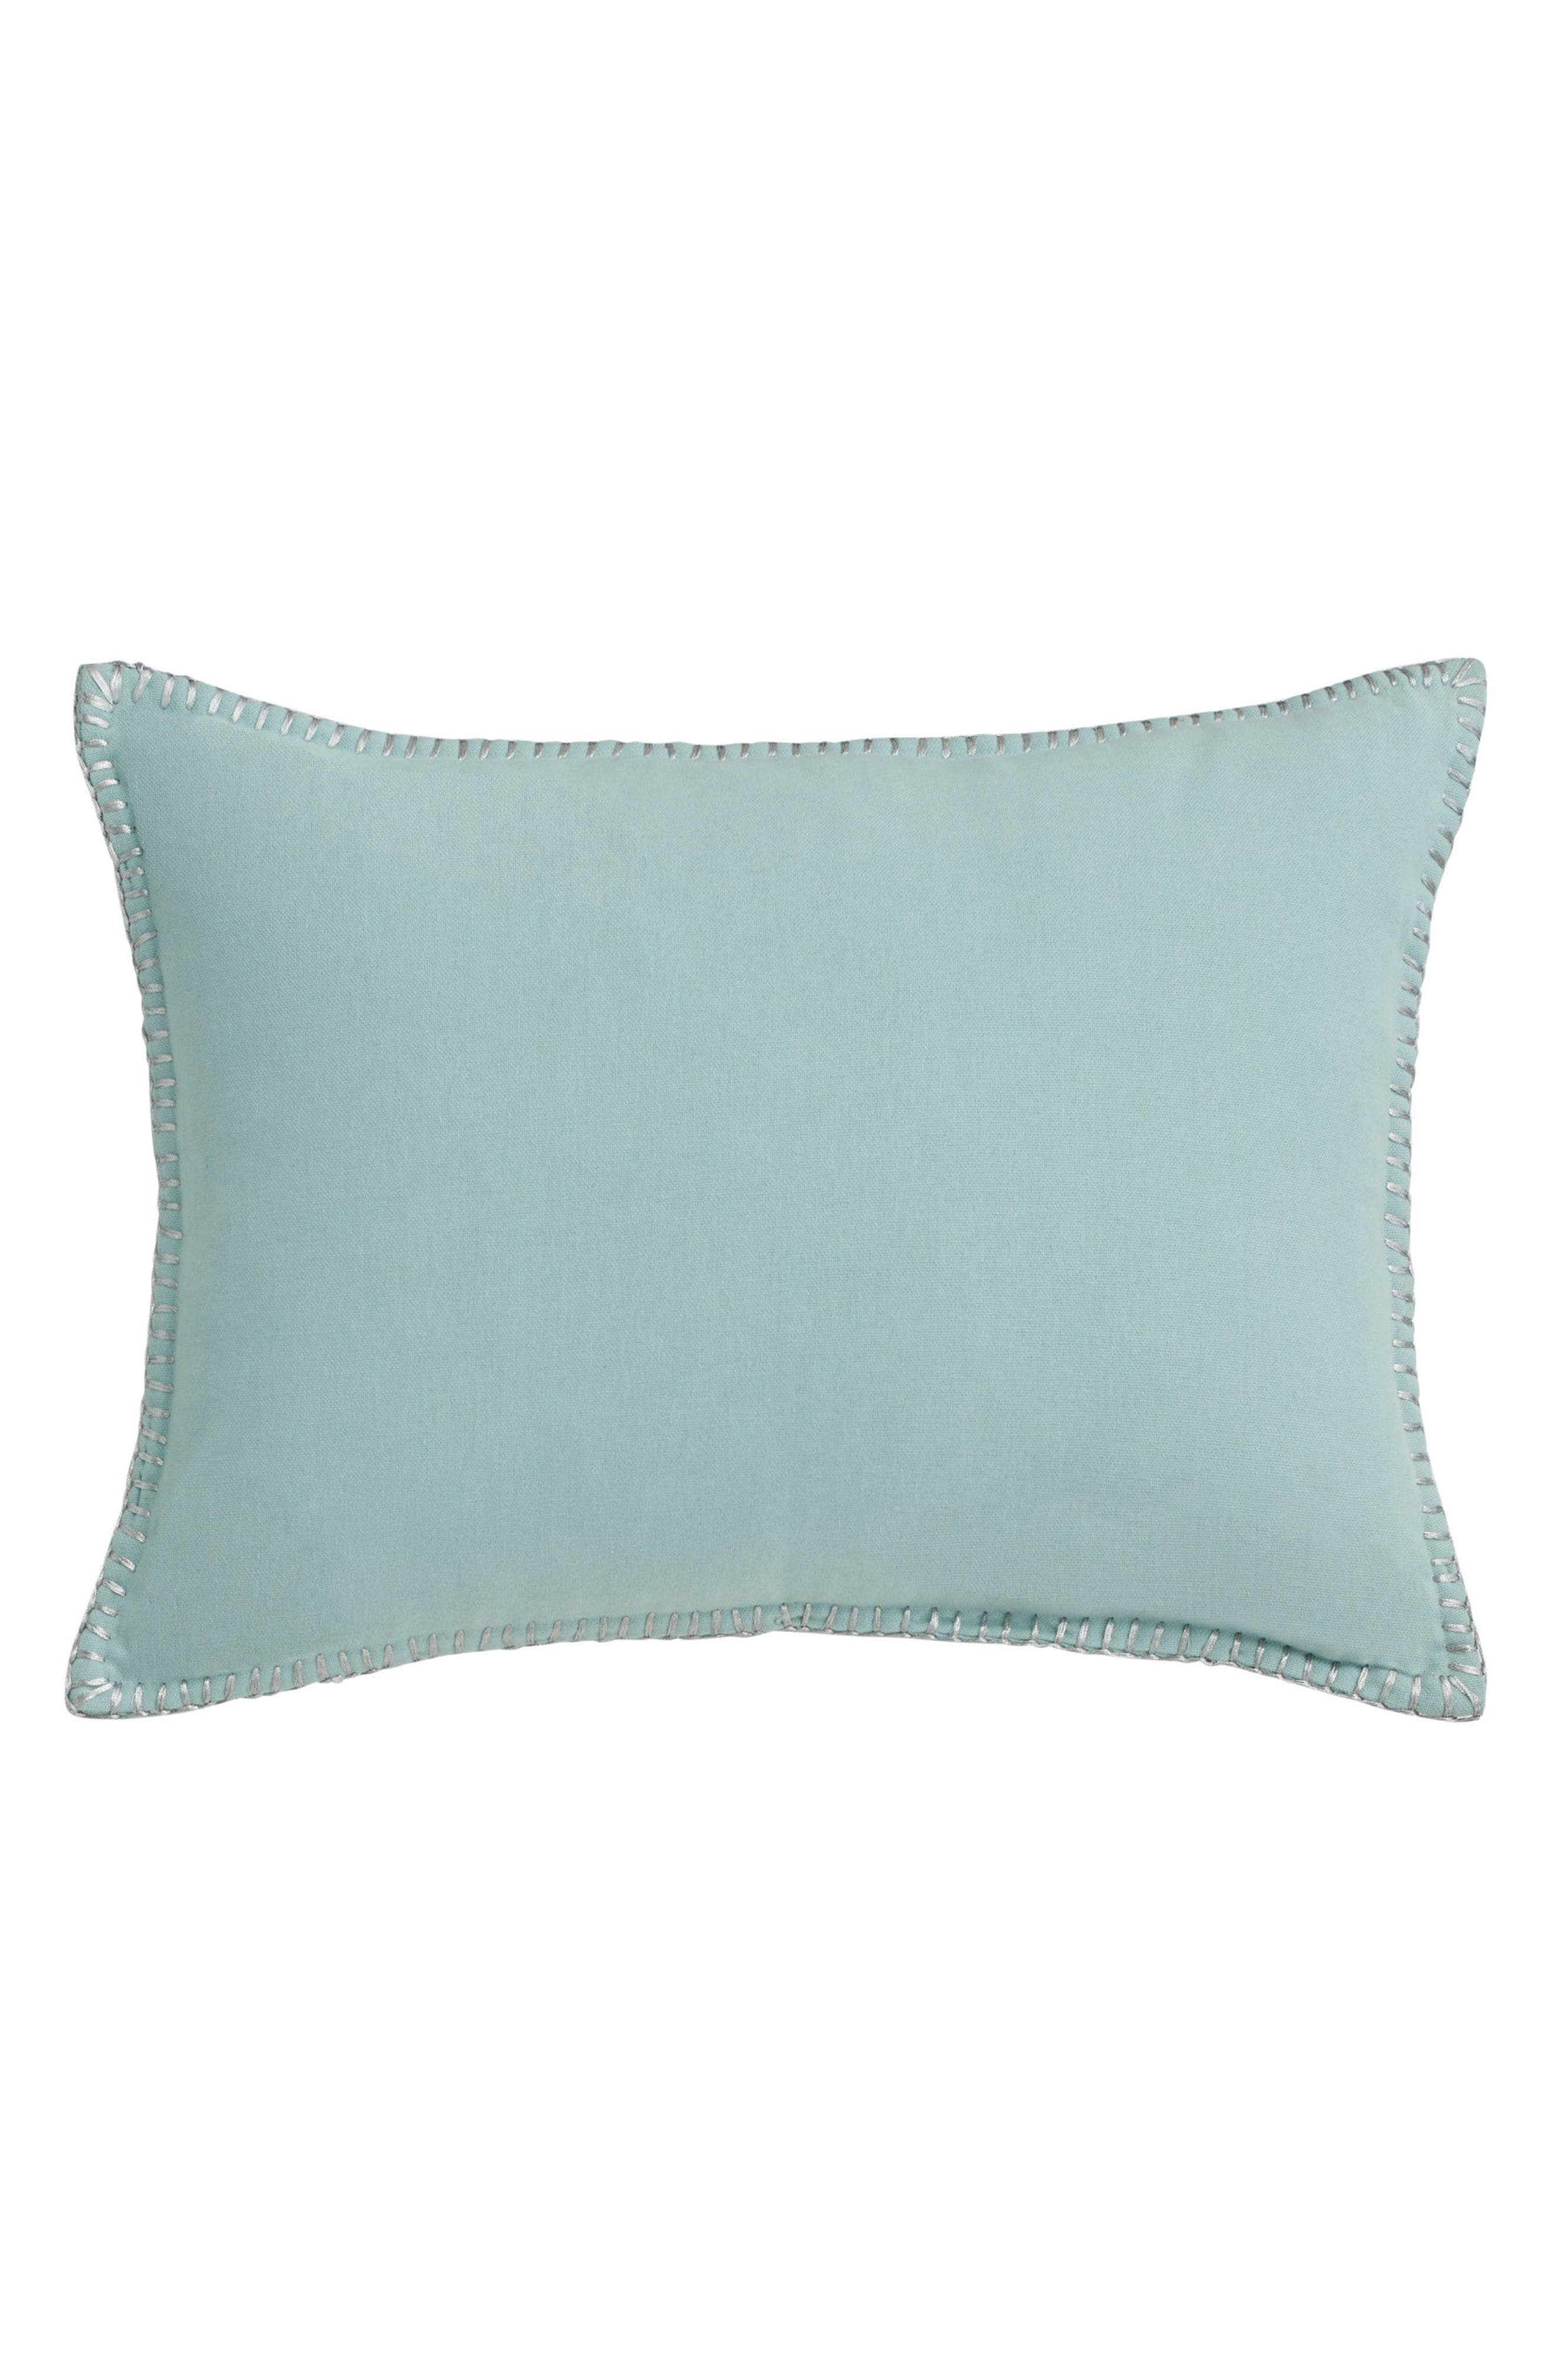 Capri Stripe Accent Pillow,                         Main,                         color,